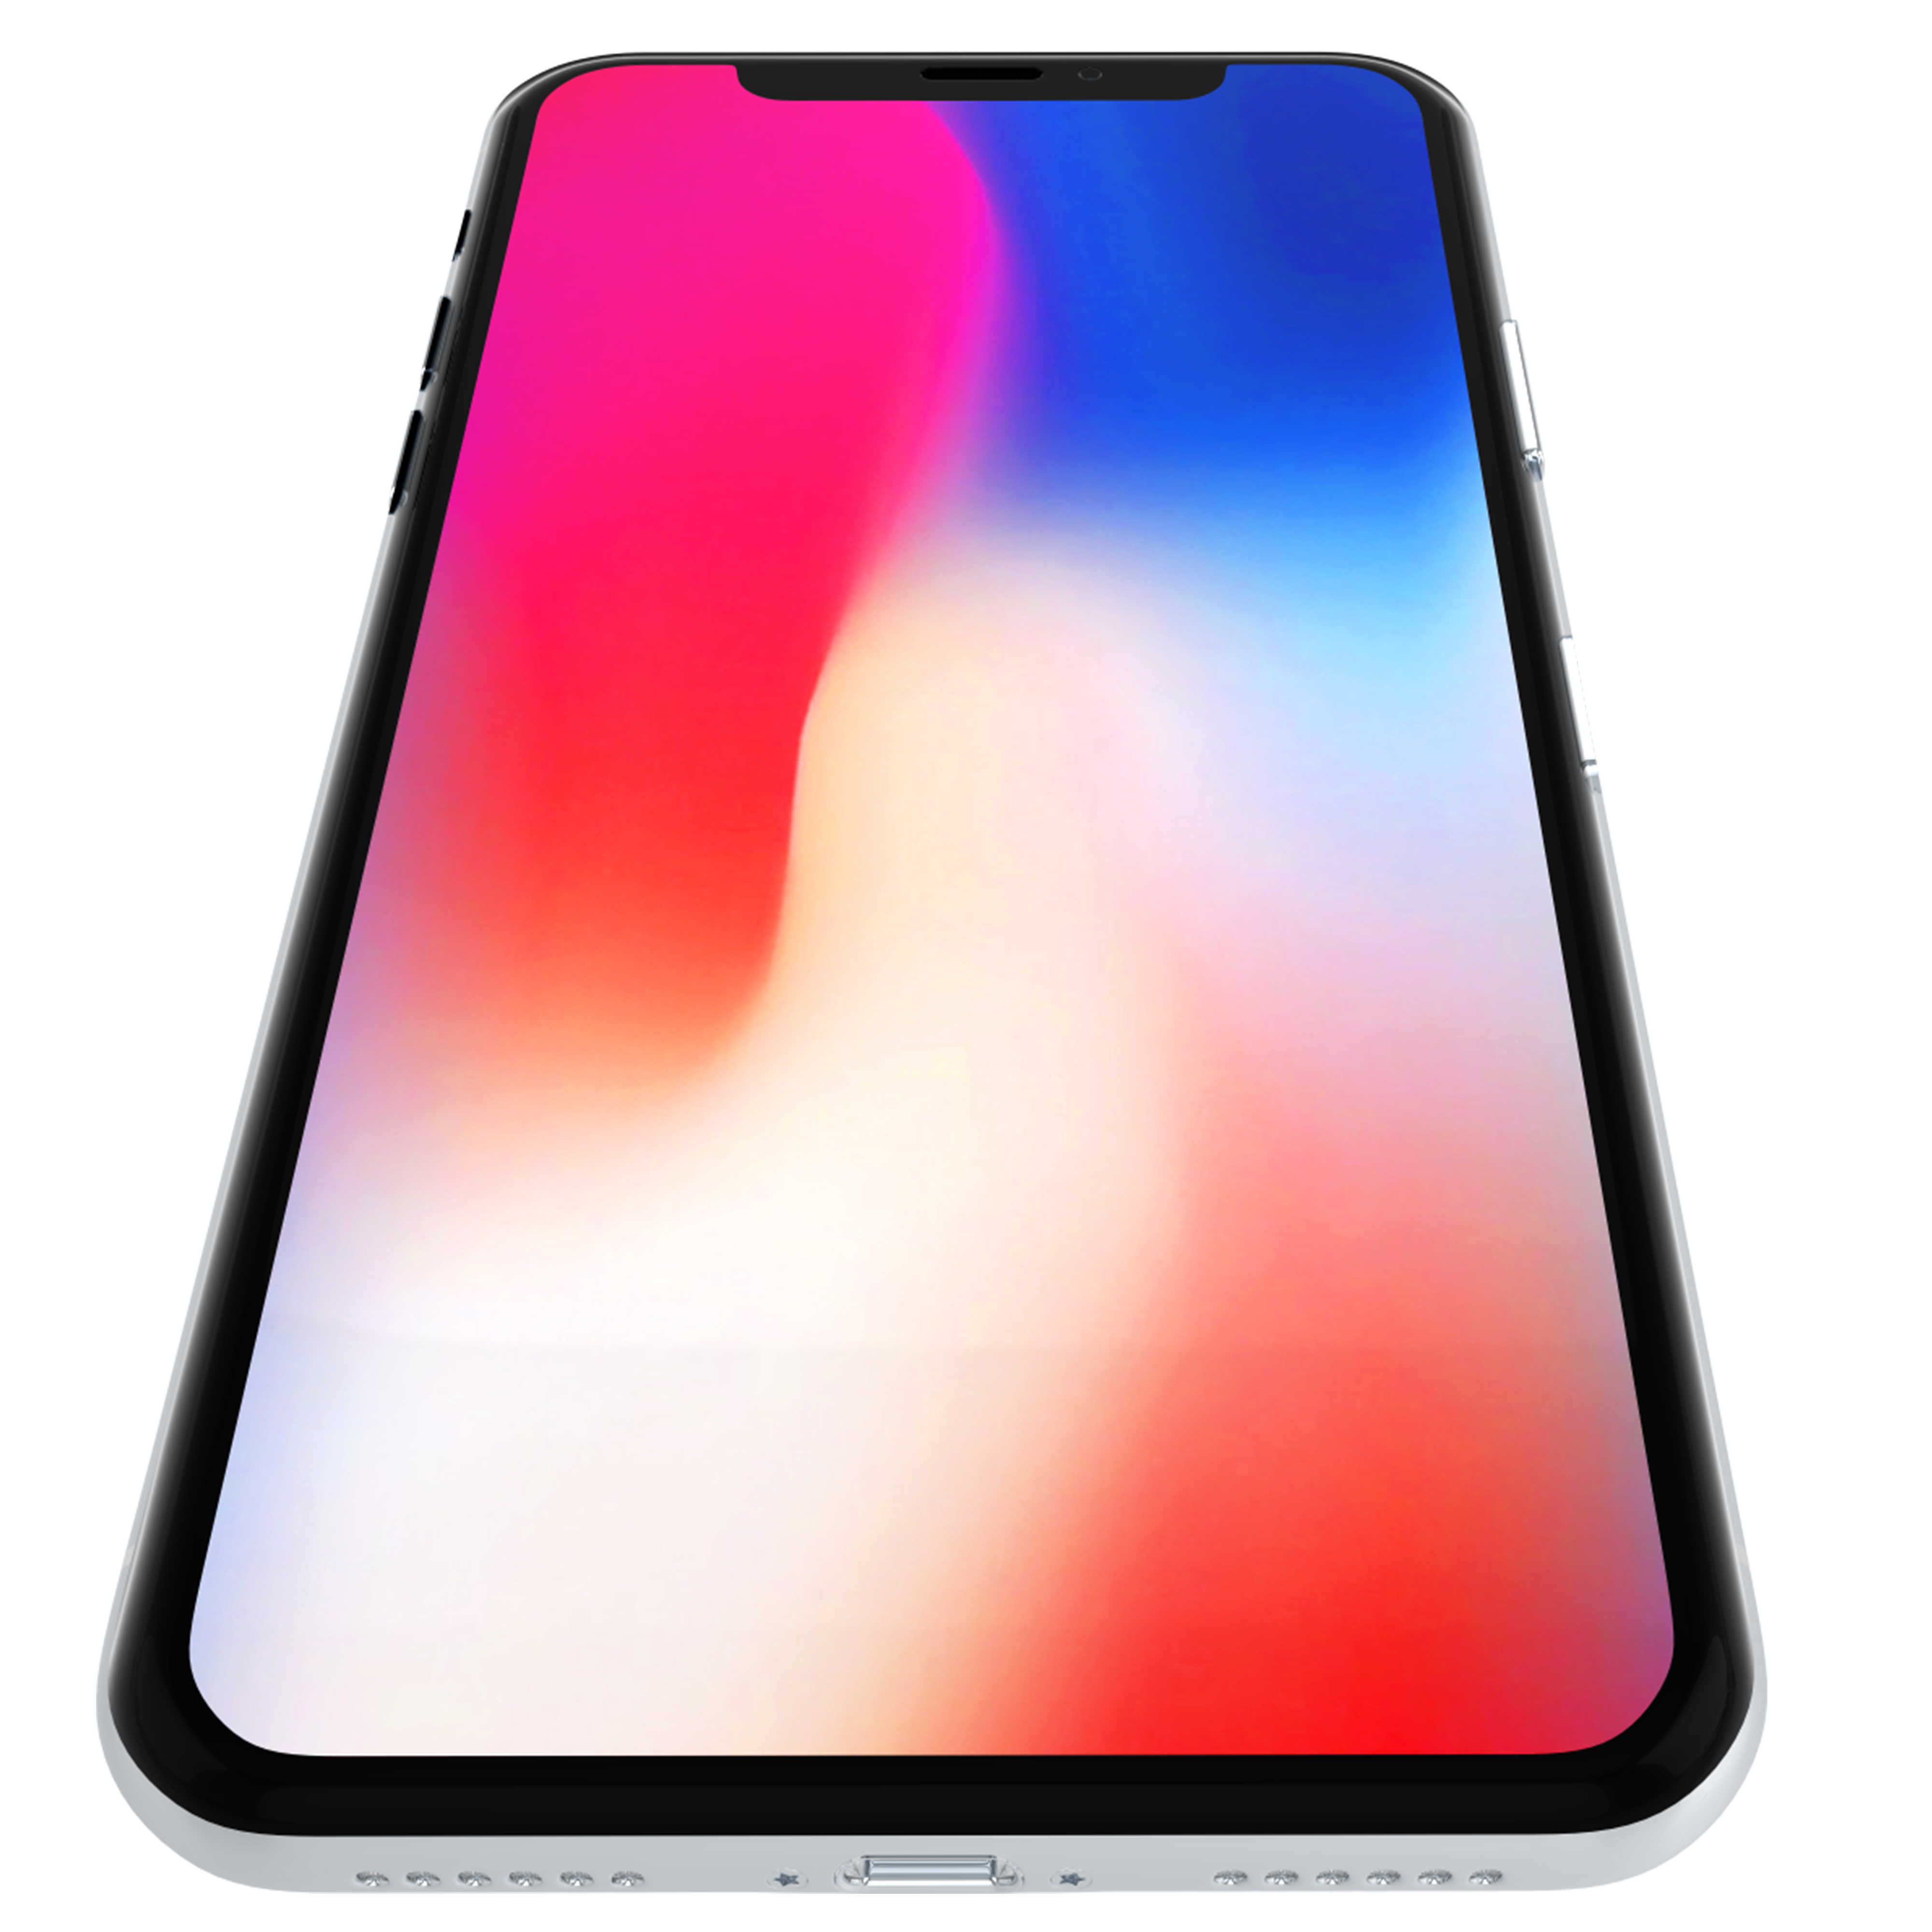 Apple iPhone X PNG Image Corazones, Fundas